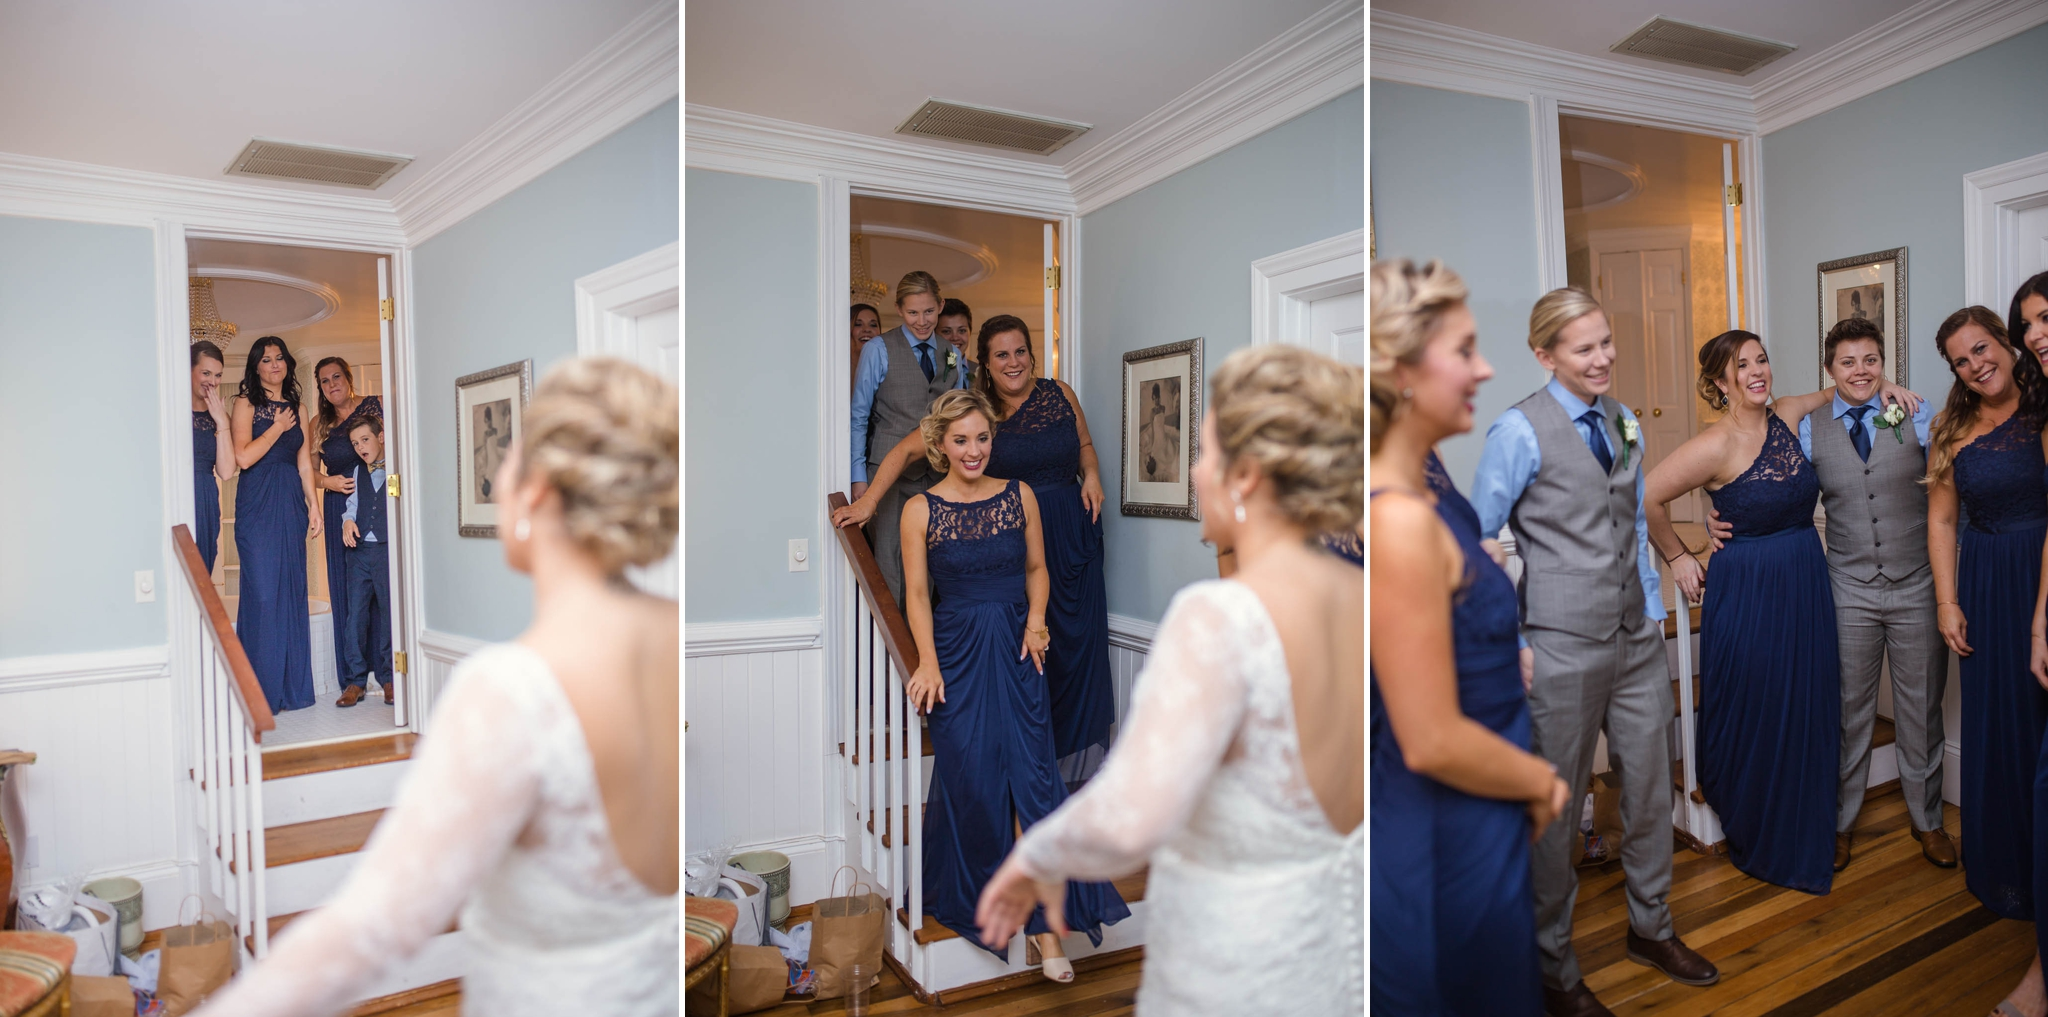 Lesbian Wedding at the Mathews House in Cary North Carolina